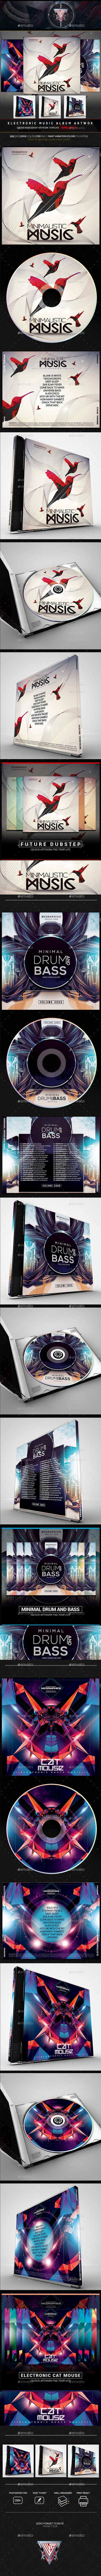 Electro Music CD/DVD Template Bundle Vol. 5 - CD & DVD Artwork Print Templates